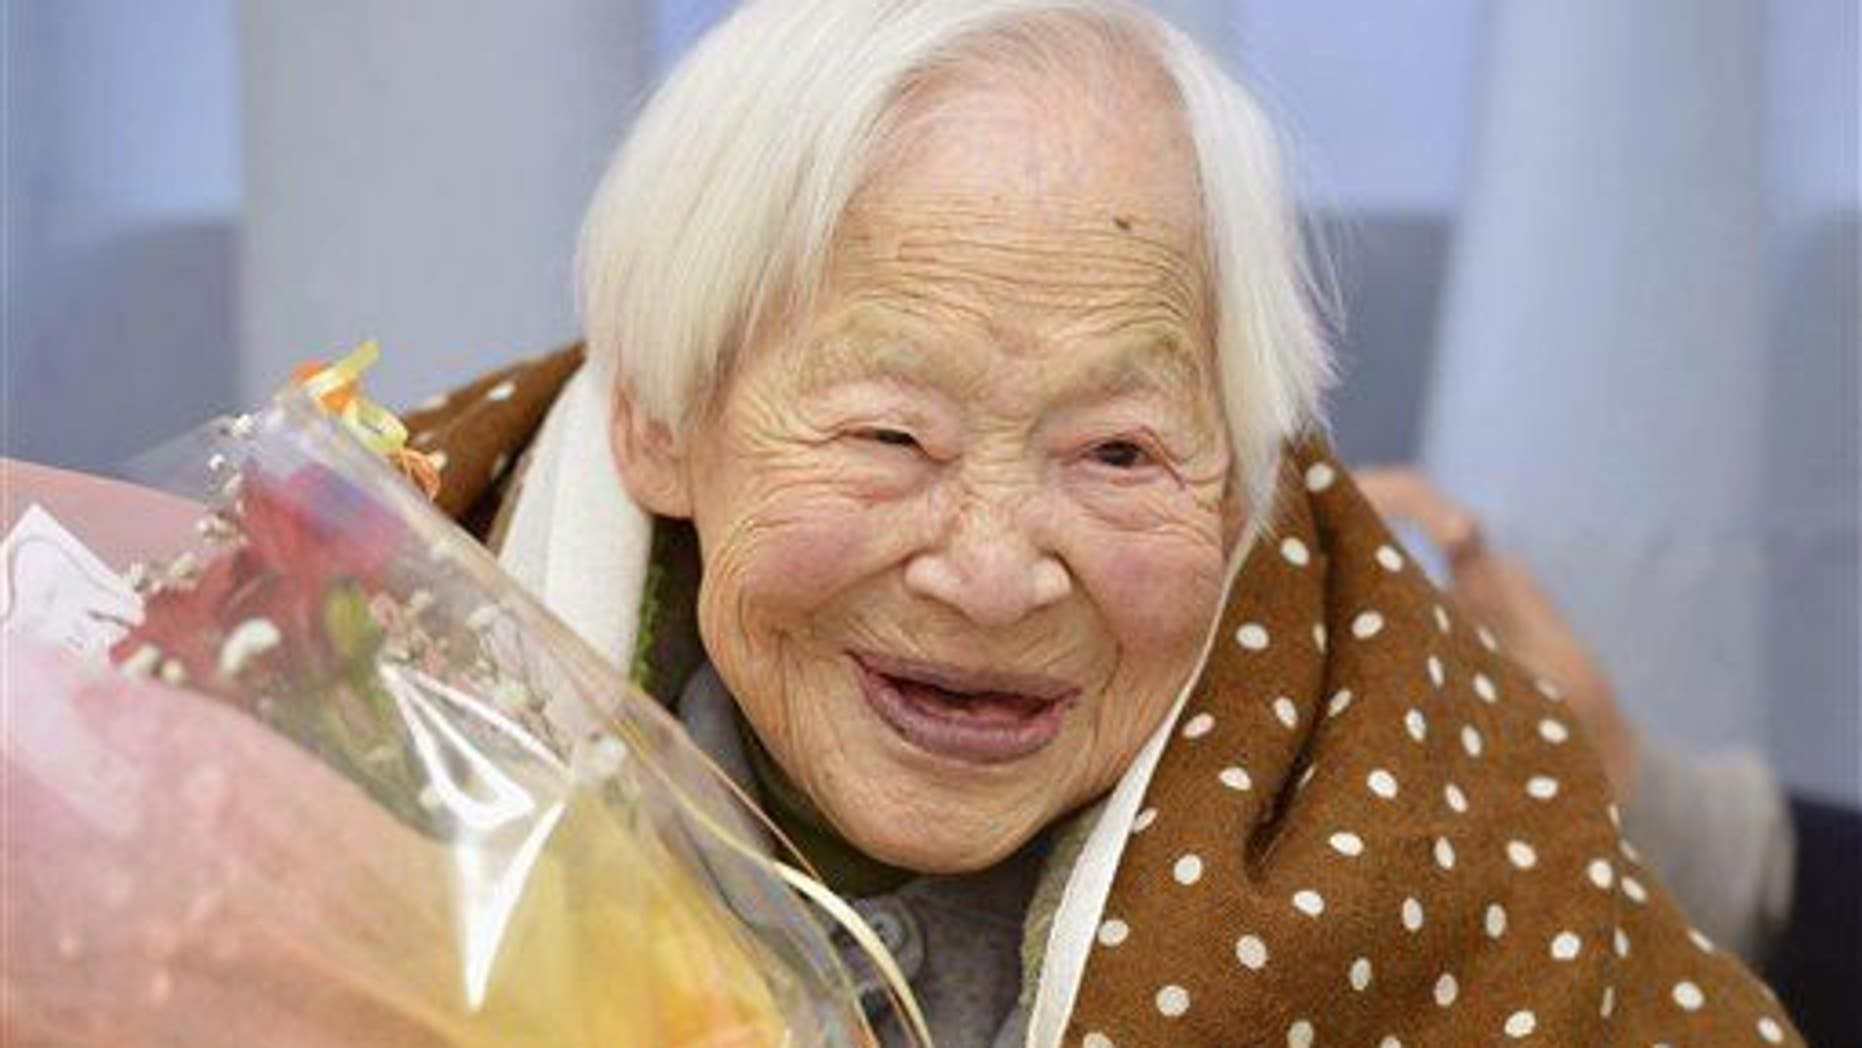 Misao Okawa celebrates her 115th birthday in Osaka, western Japan Tuesday, March 5, 2013. Okawa was formally recognized last week as the world's oldest woman.